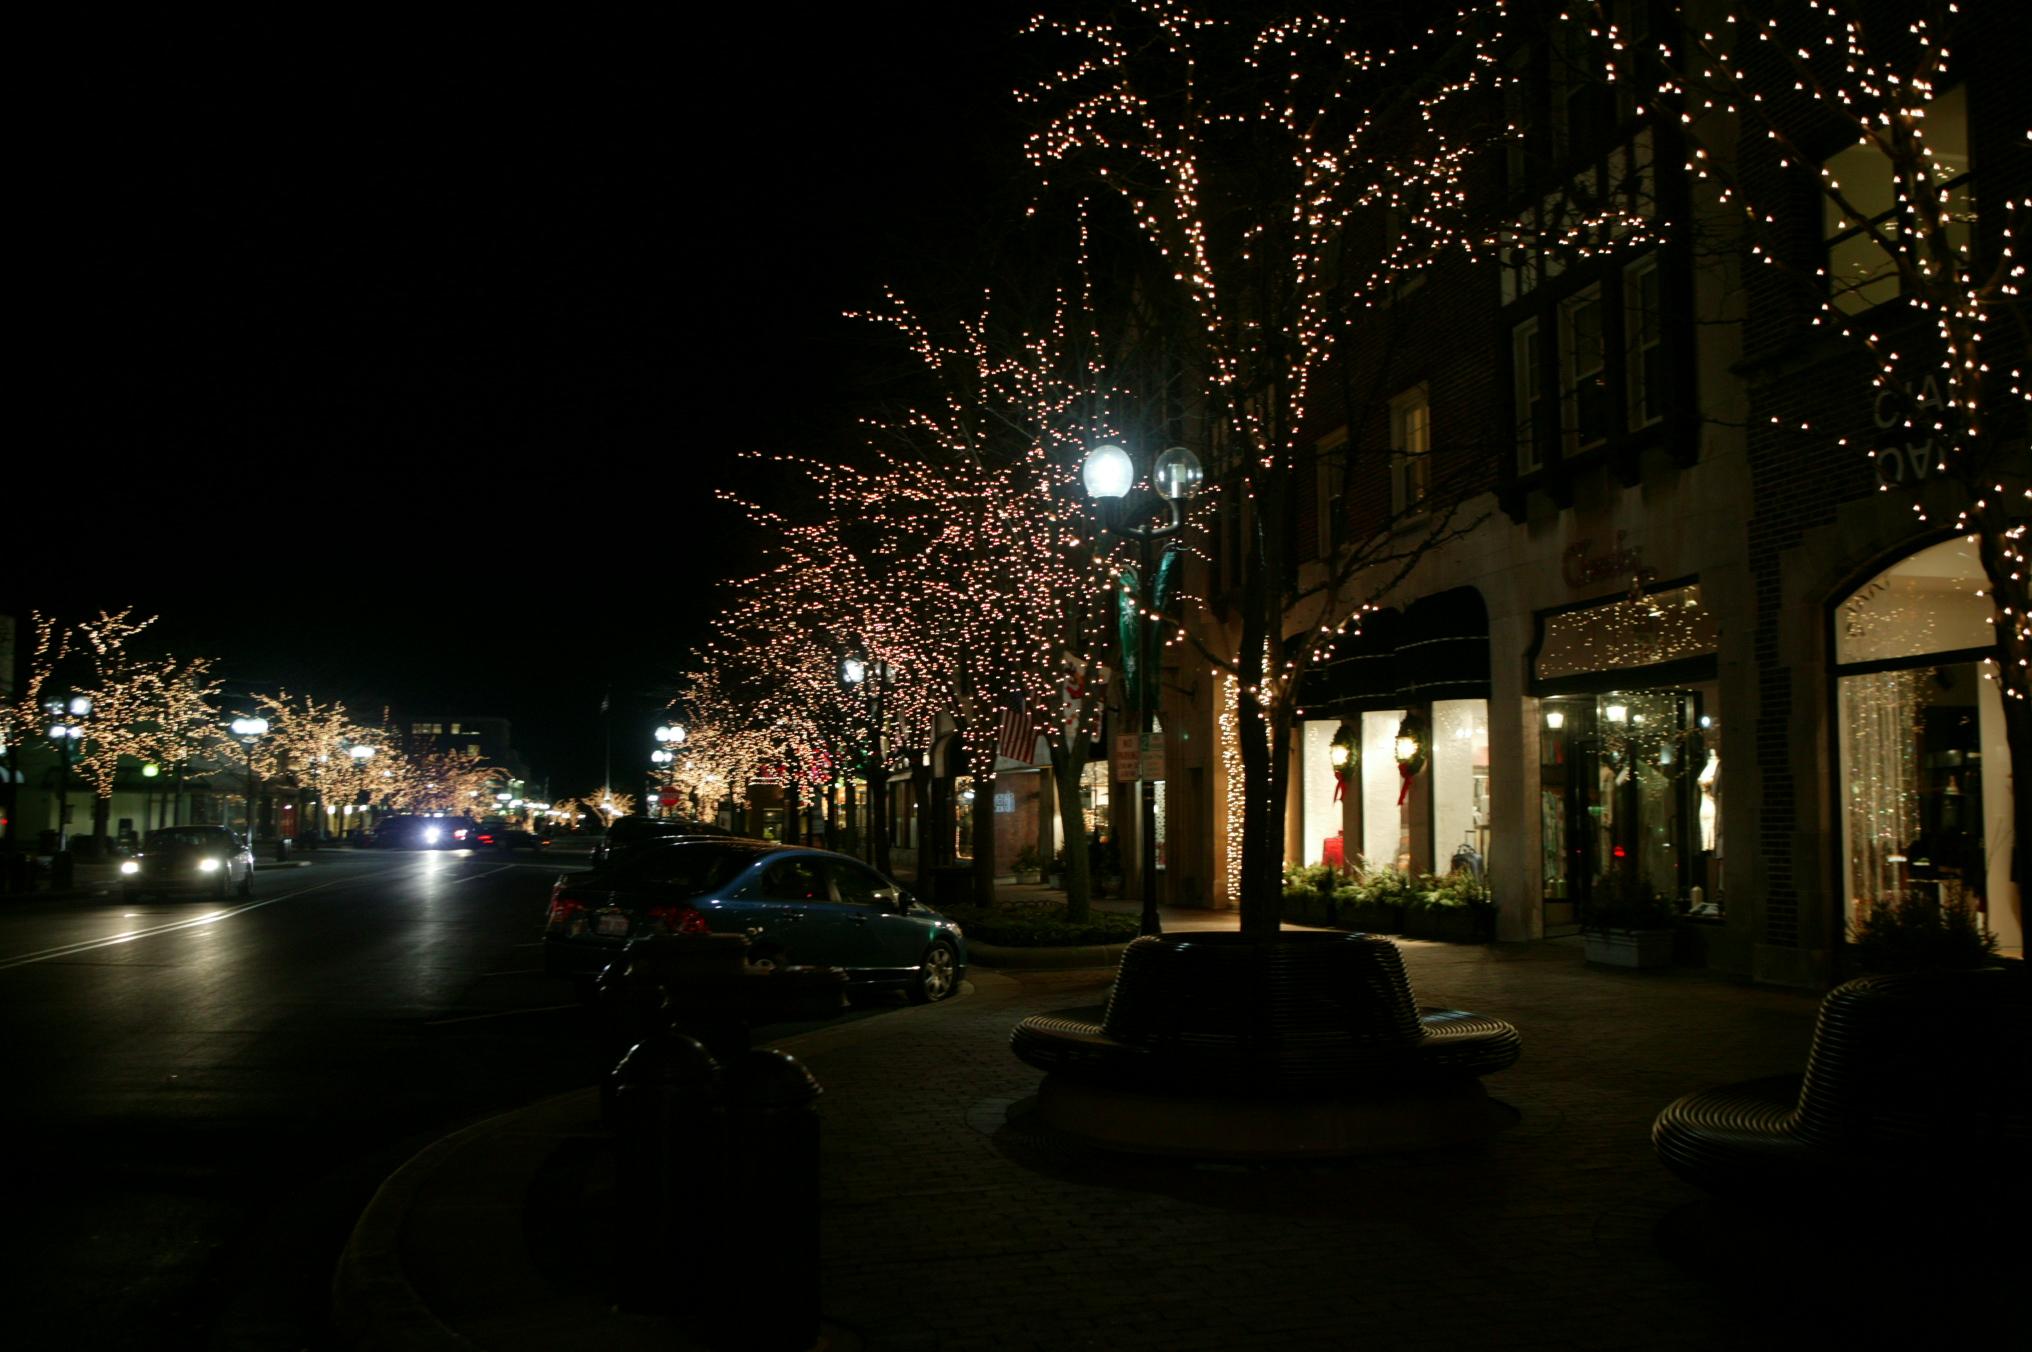 lights.2 011.jpg